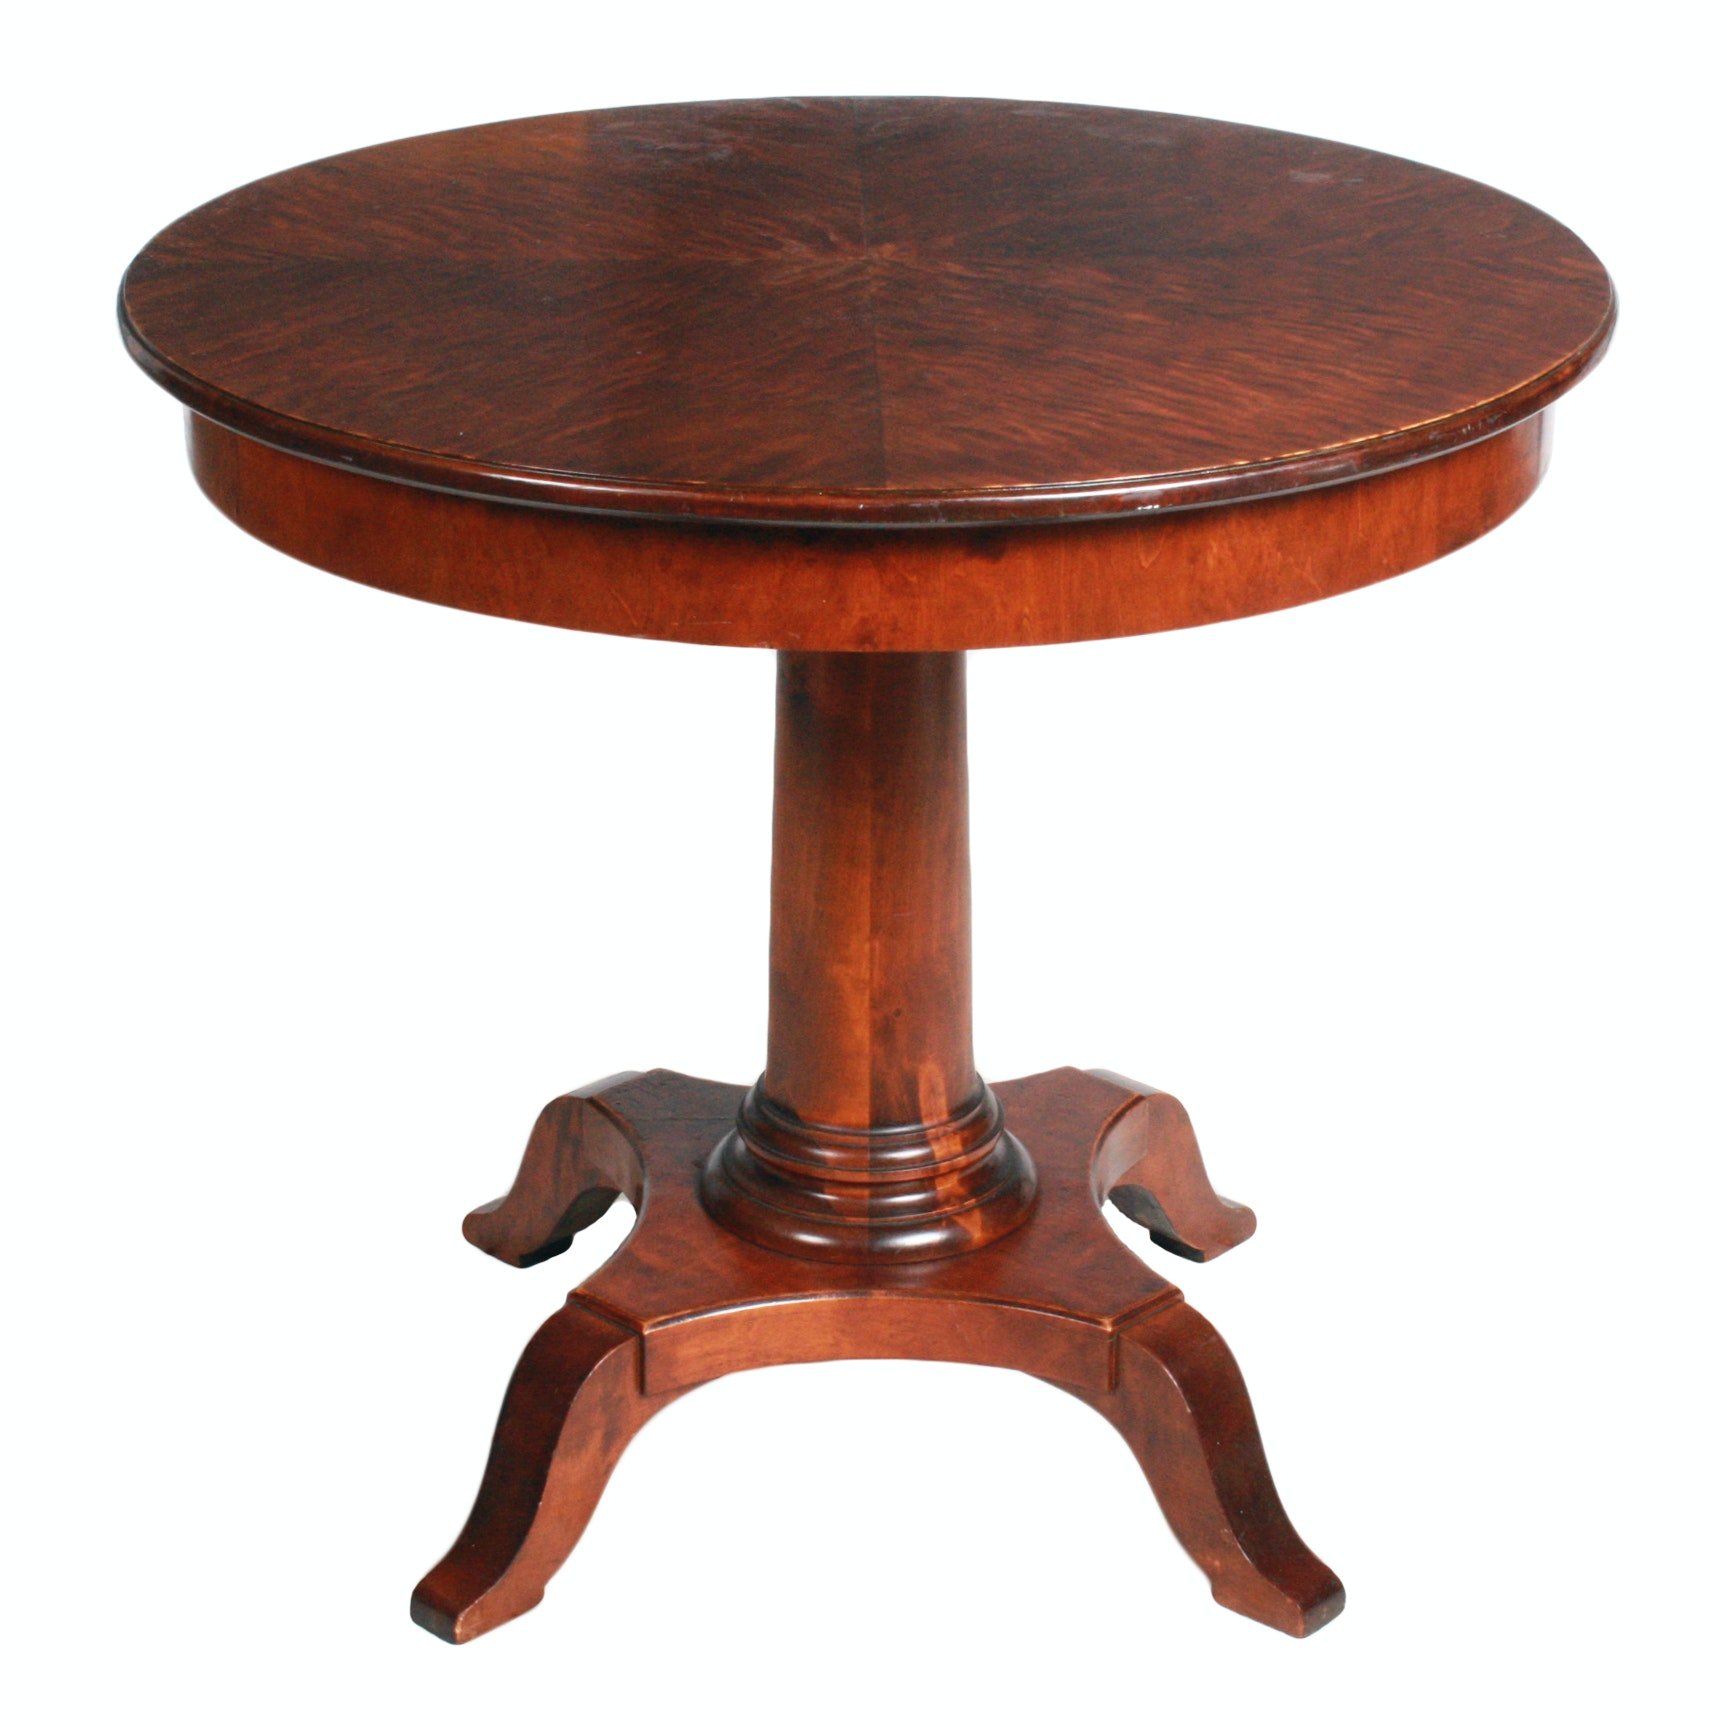 Swedish Biedermeier Style Center Table